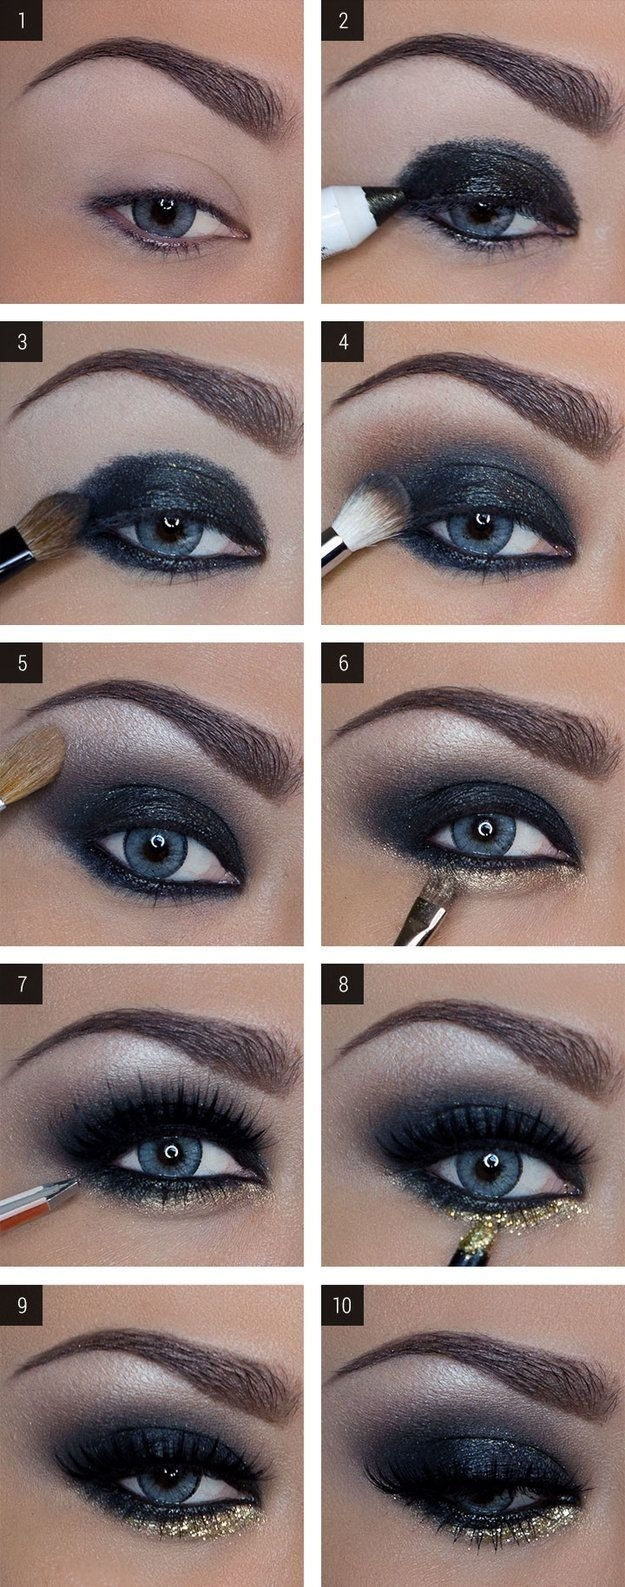 Lovely Makeup Tutorials For Blue Eyes   Make Up   Pinterest   Makeup inside How To Do Dramatic Eye Makeup For Blue Eyes